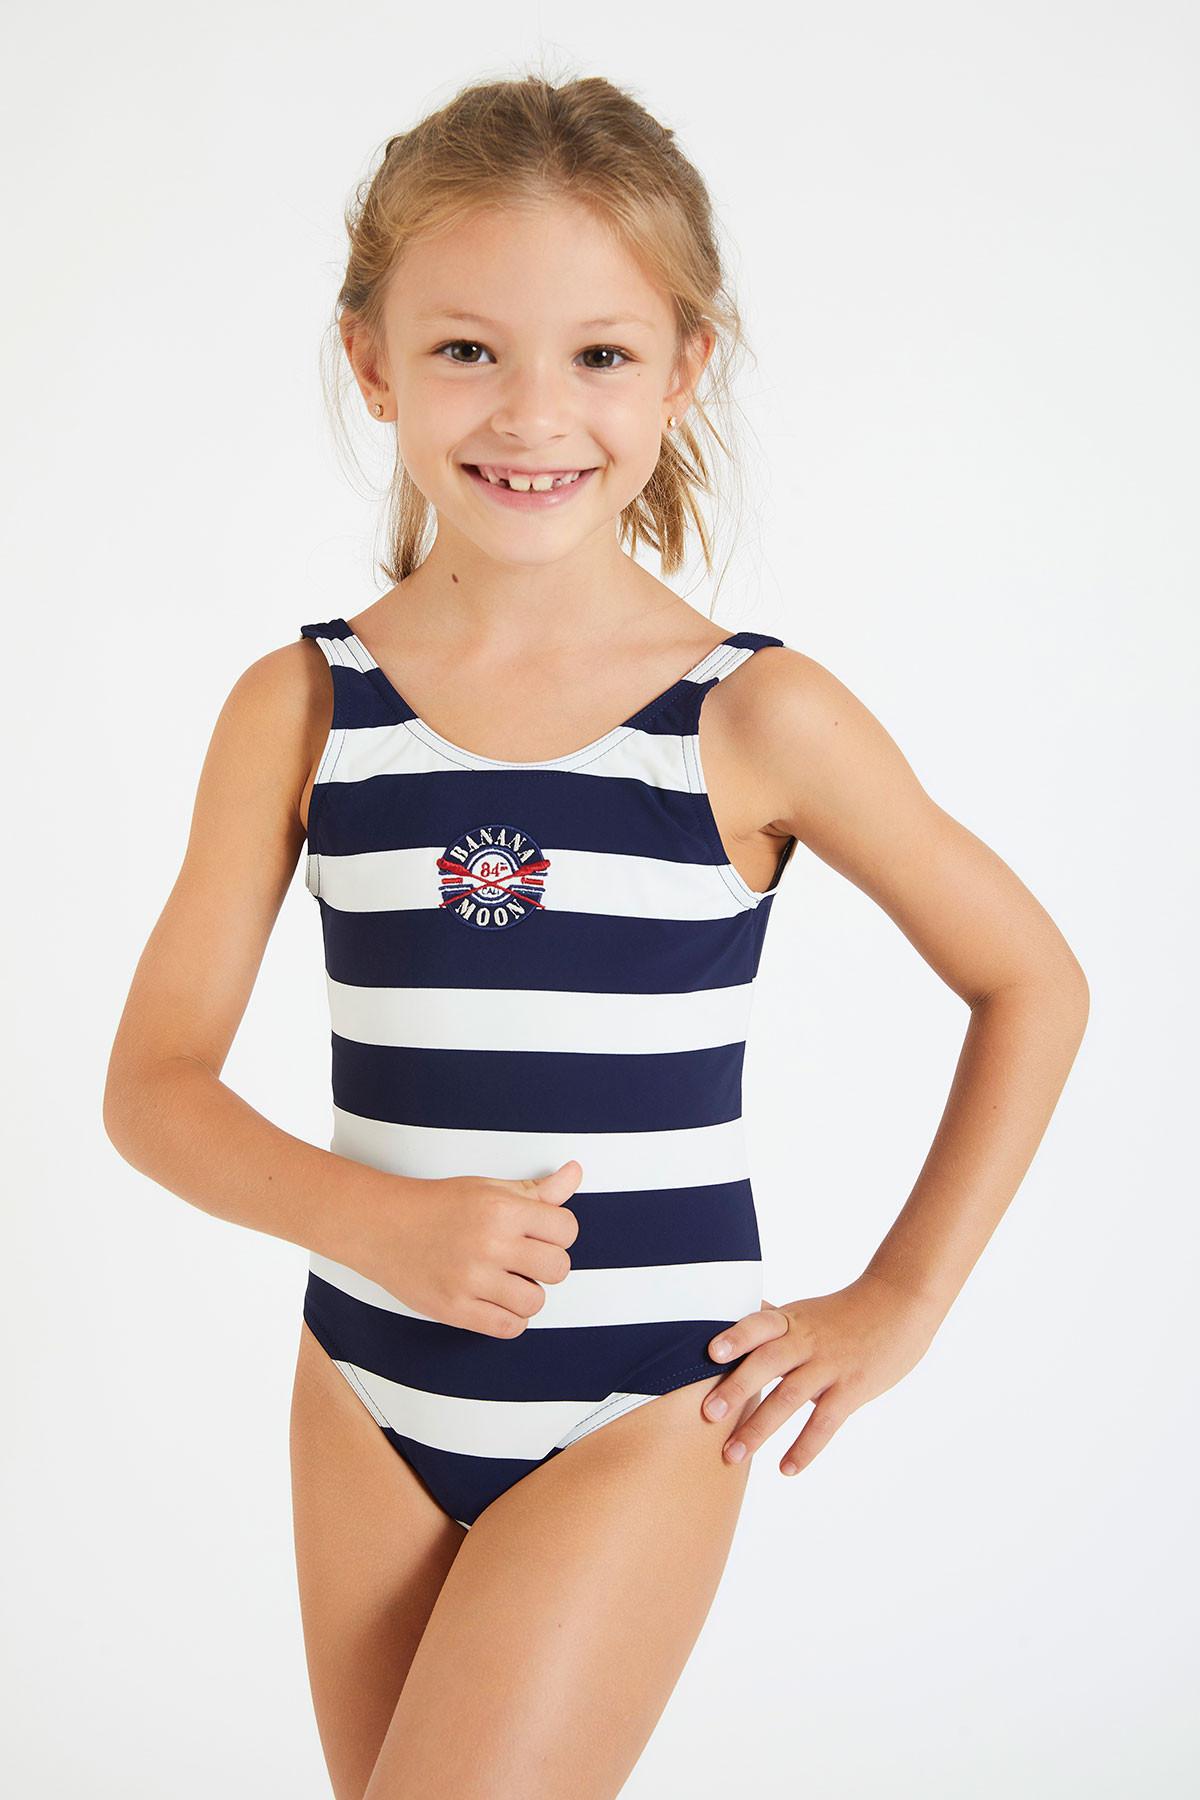 M Blue Beachcombers Girls One Piece Swim Suit Dancing Mermaid